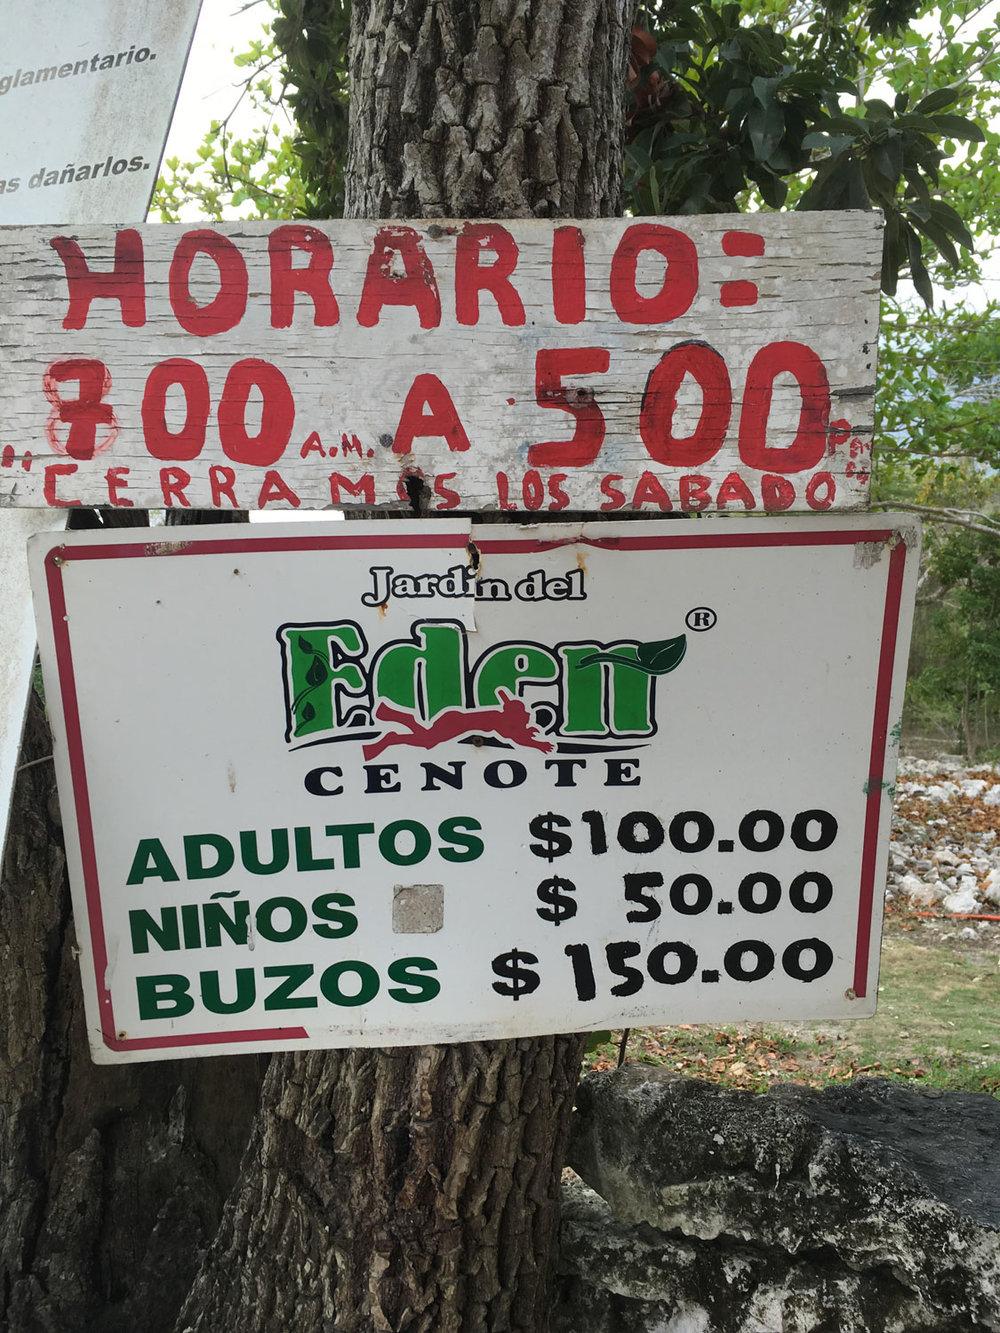 Hammocks_and_Ruins_Riviera_Maya_Mexico_Explore_What_to_Do_Playa_del_Carmen_Cenotes_29.jpg